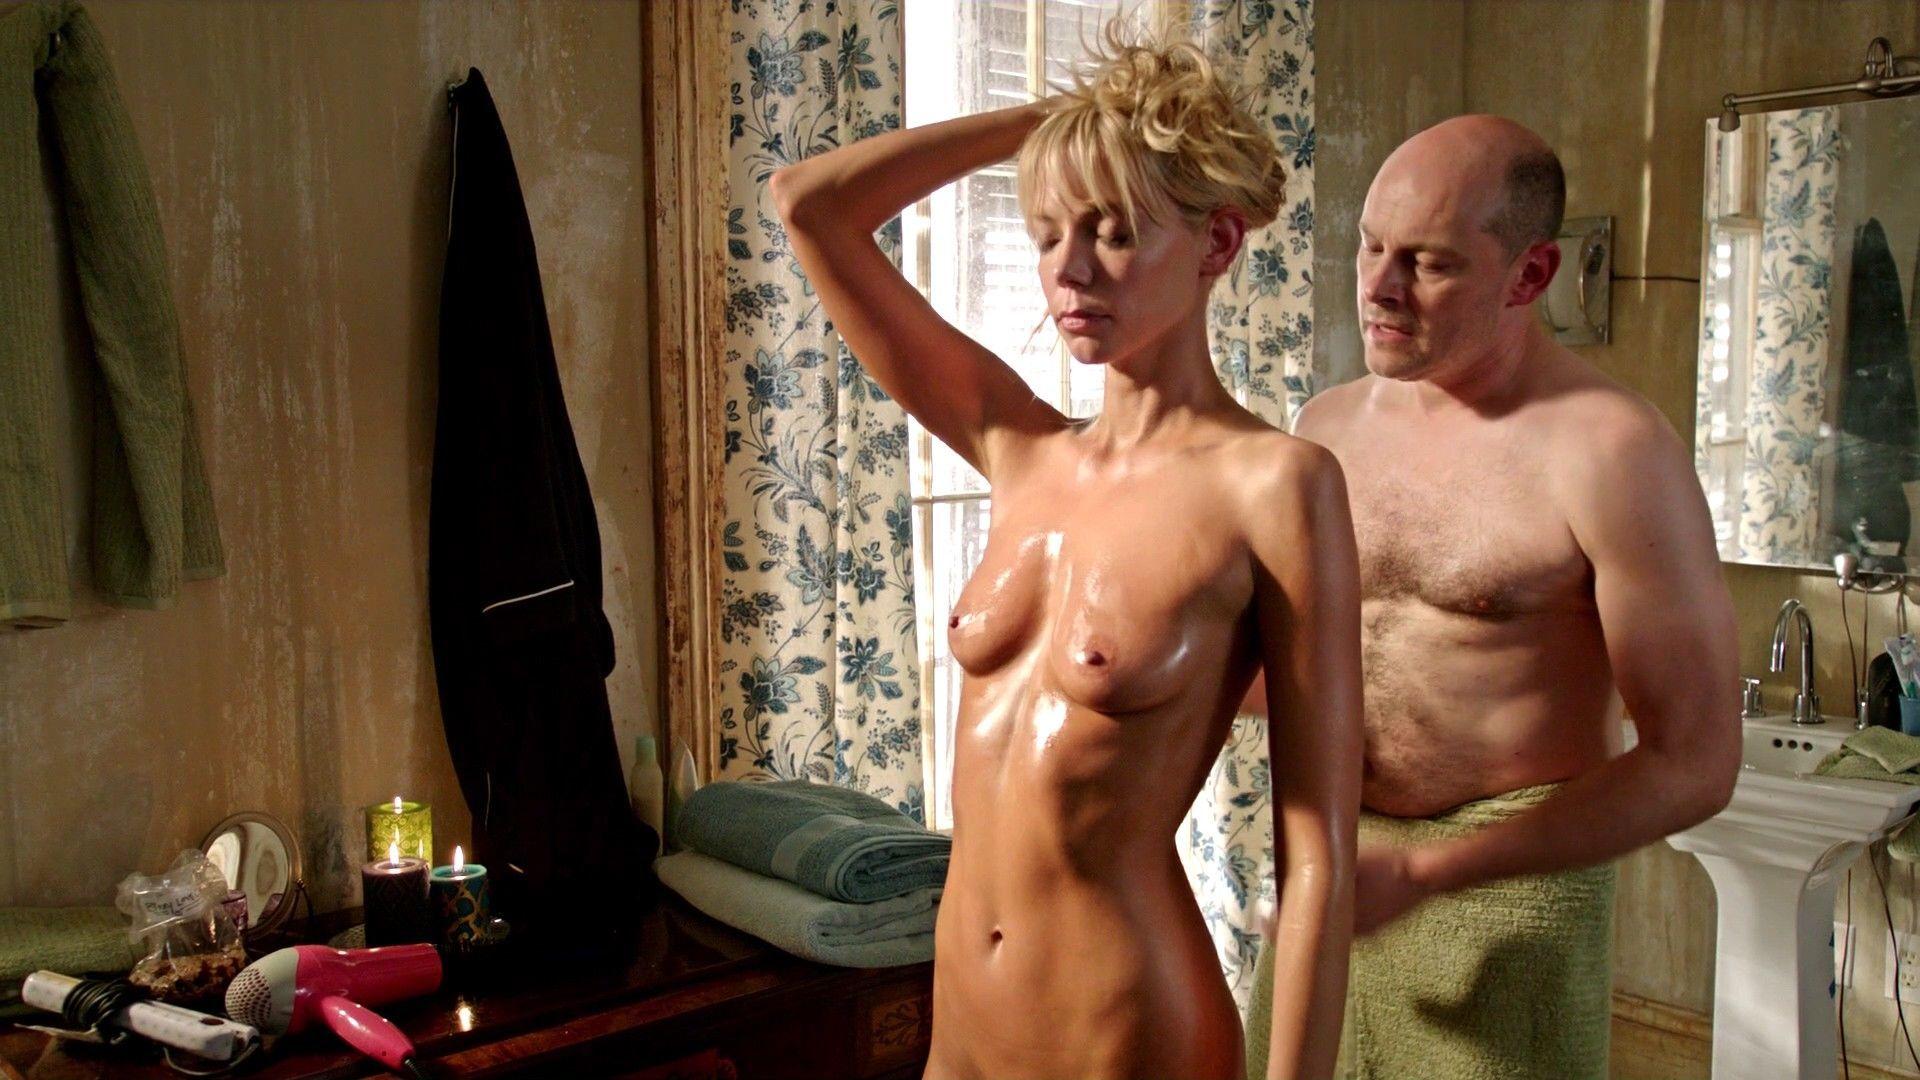 Dirty harry nude scenes